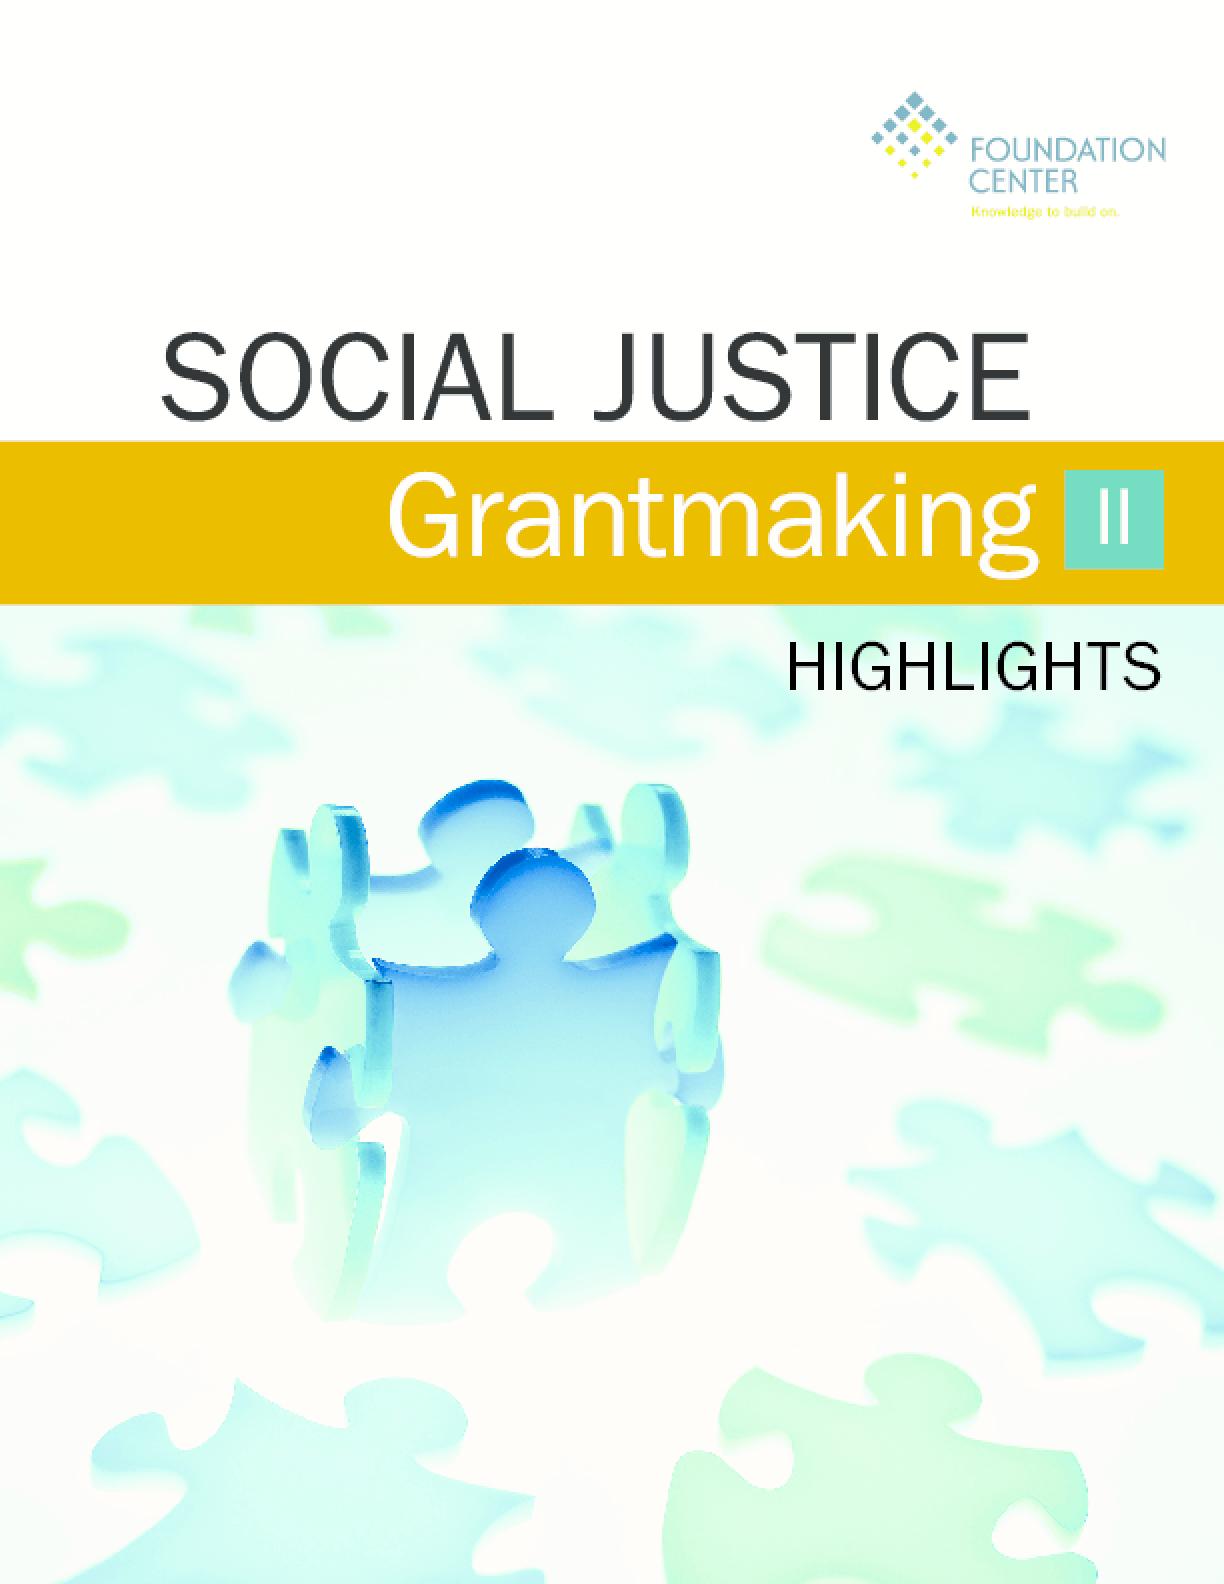 Social Justice Grantmaking II: Highlights